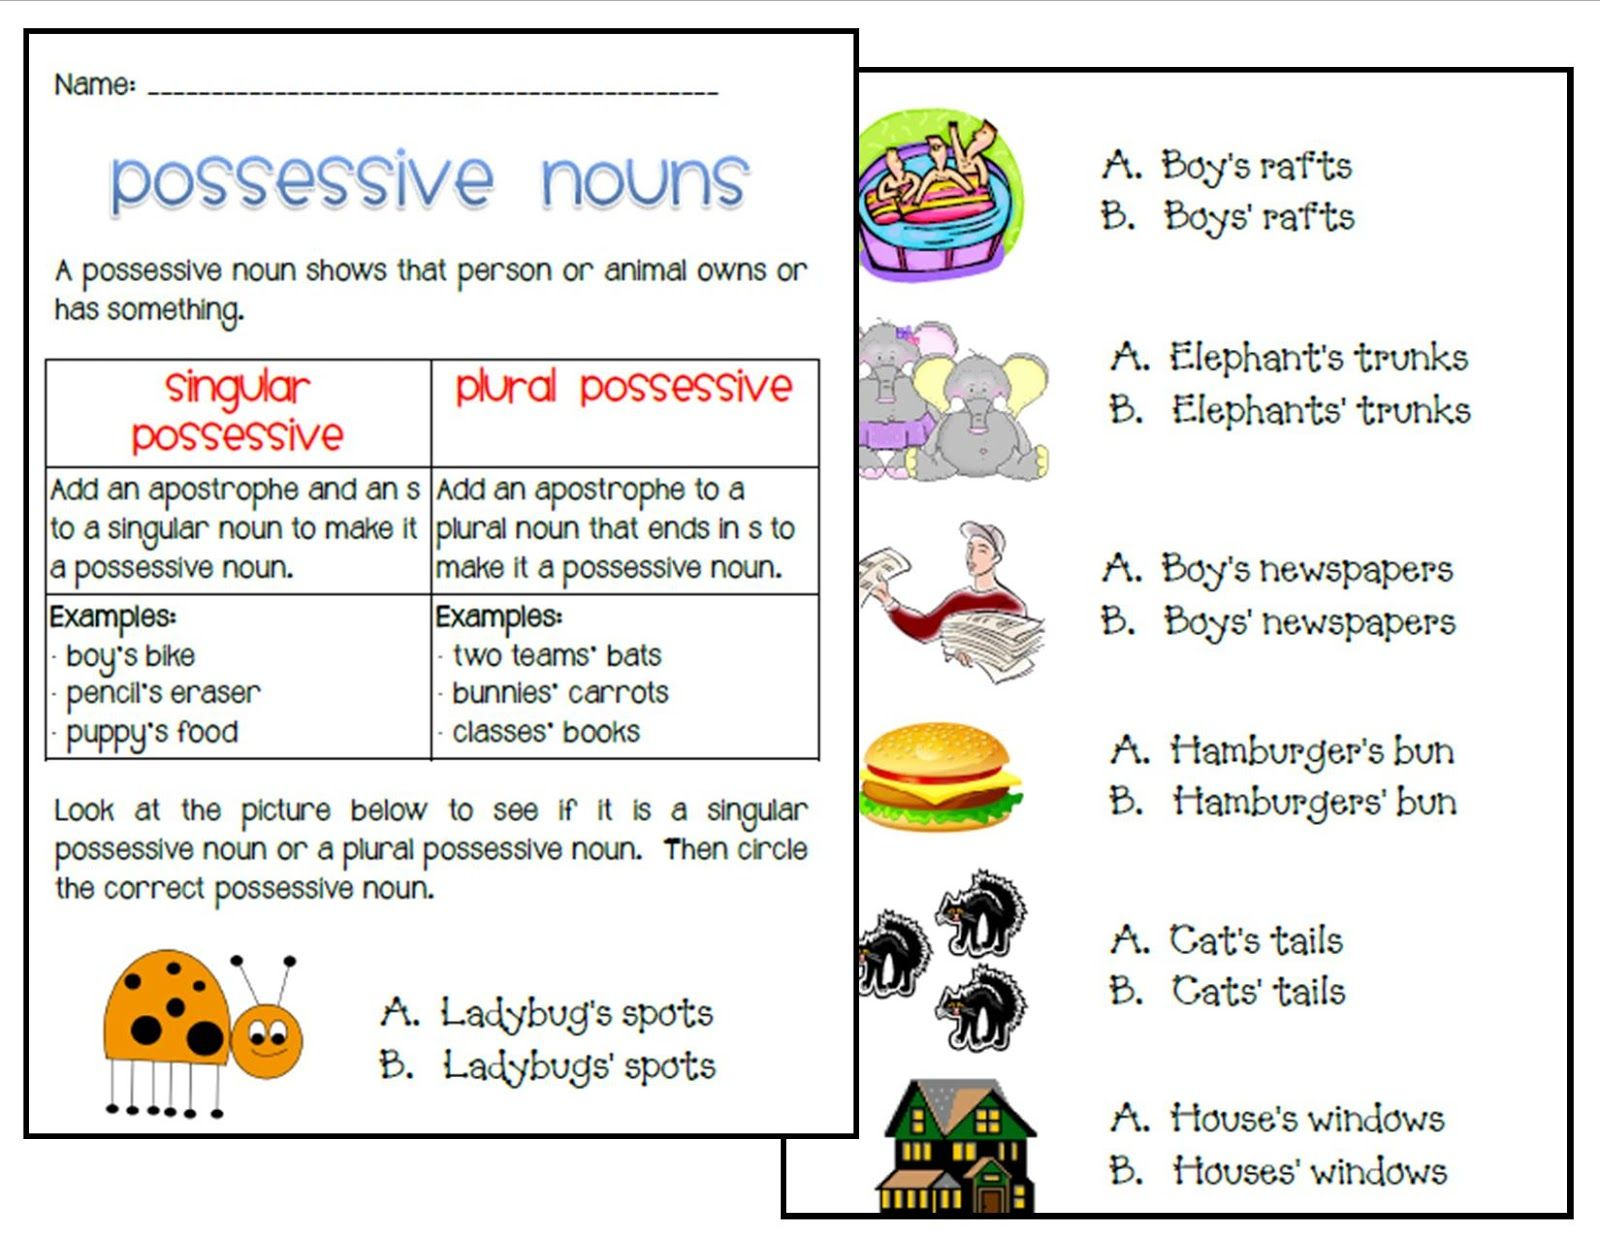 medium resolution of Singular and Plural Possessive Nouns   Possessive nouns